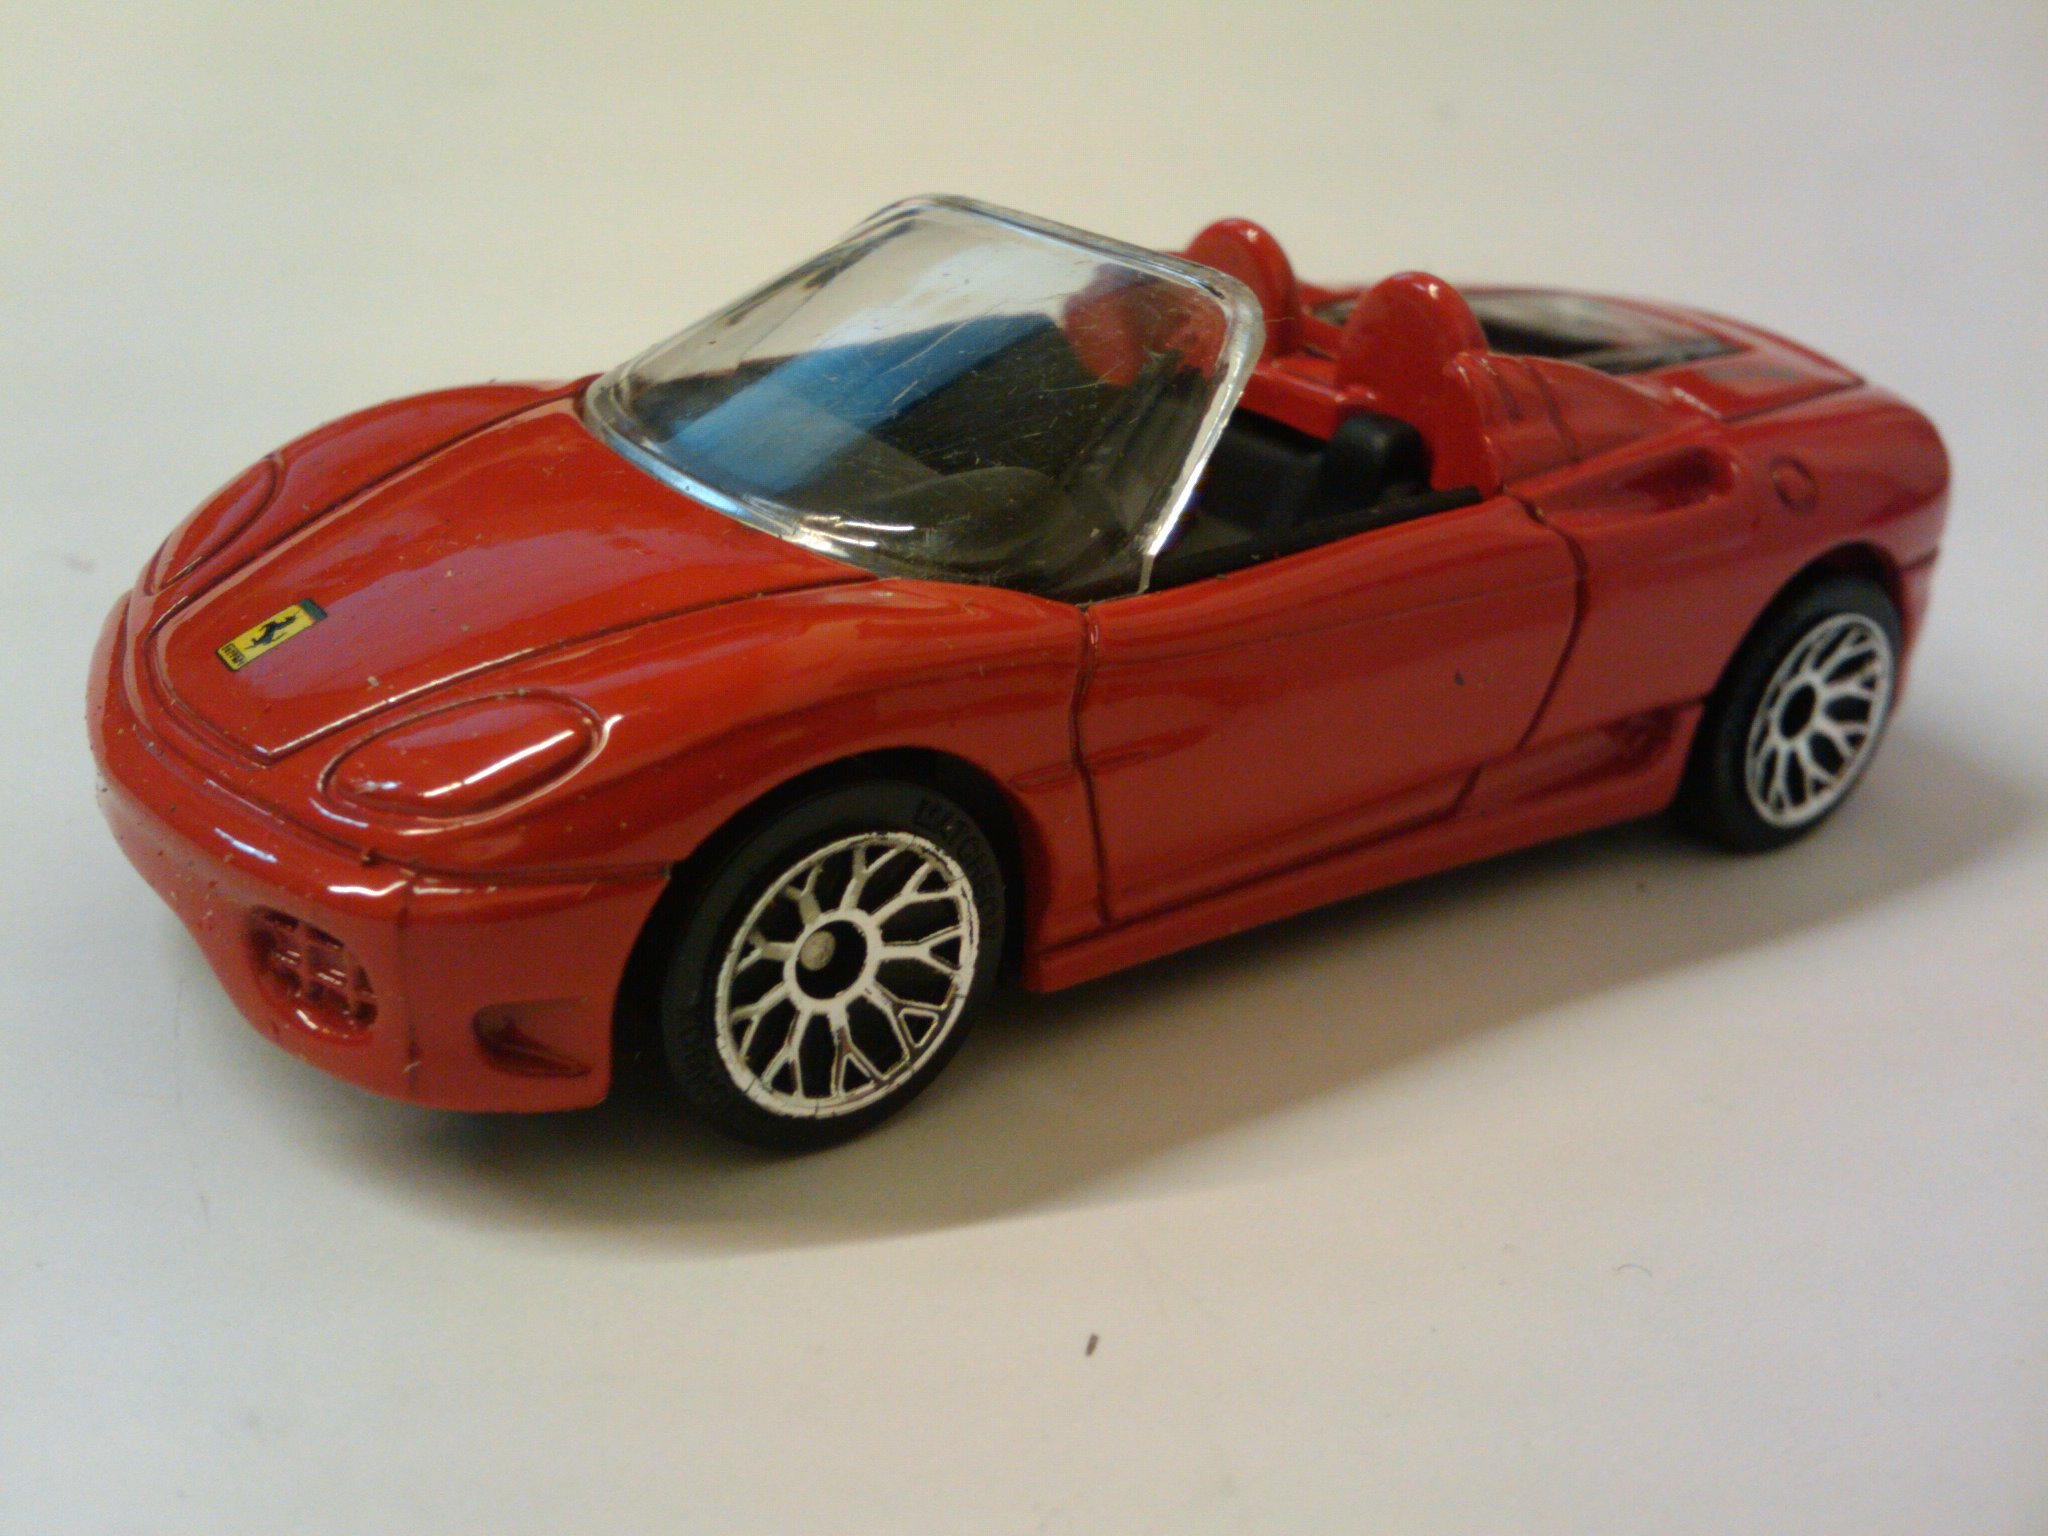 Ferrari F40 | Matchbox Cars Wiki | Fandom powered by Wikia